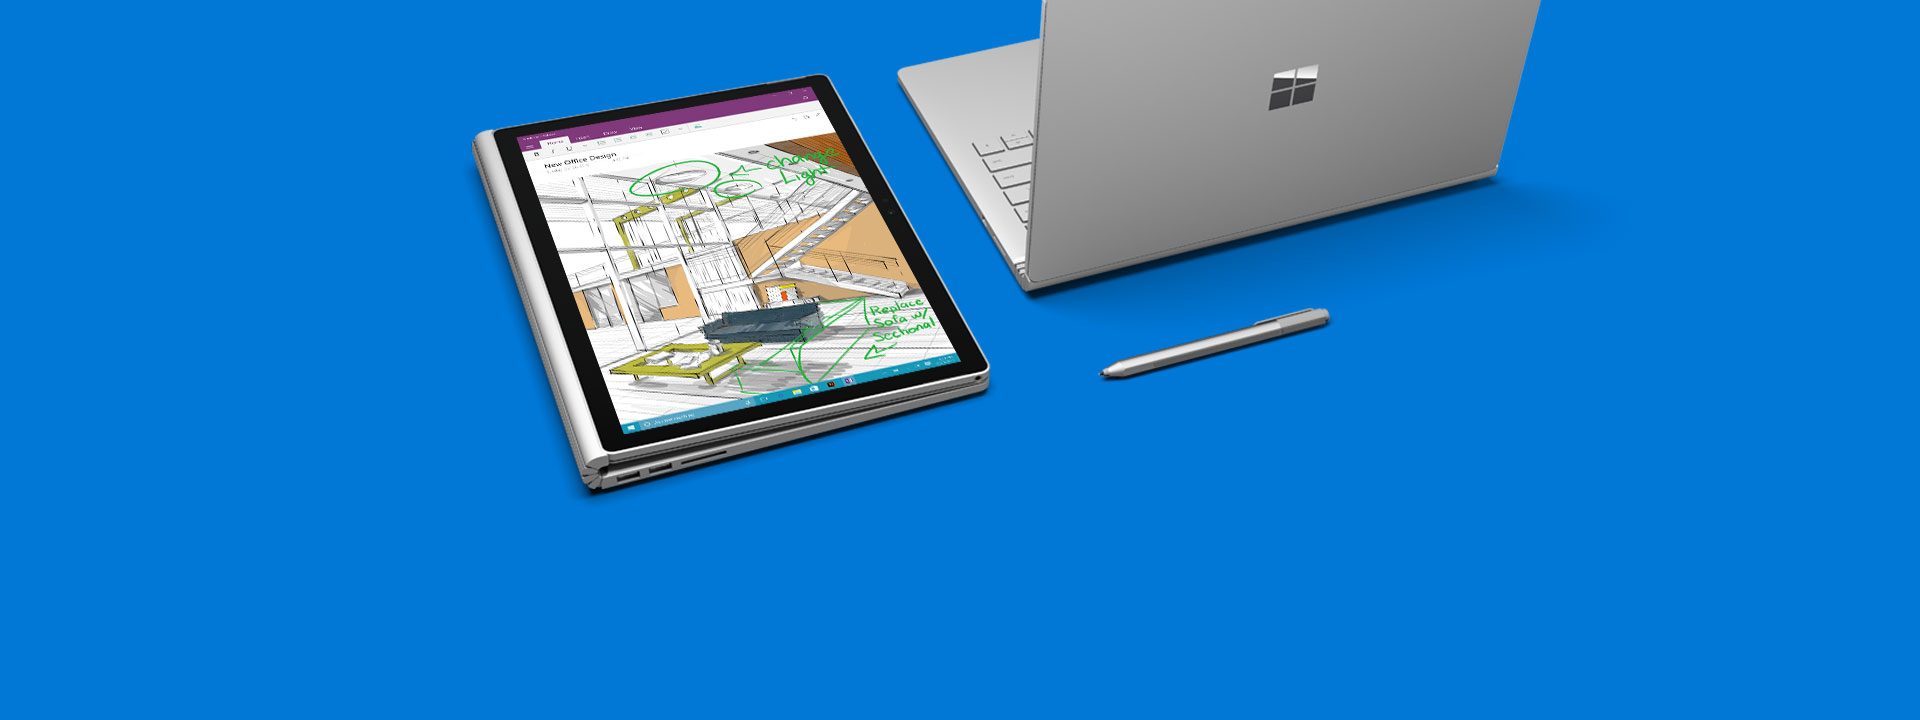 详细了解 Surface Book